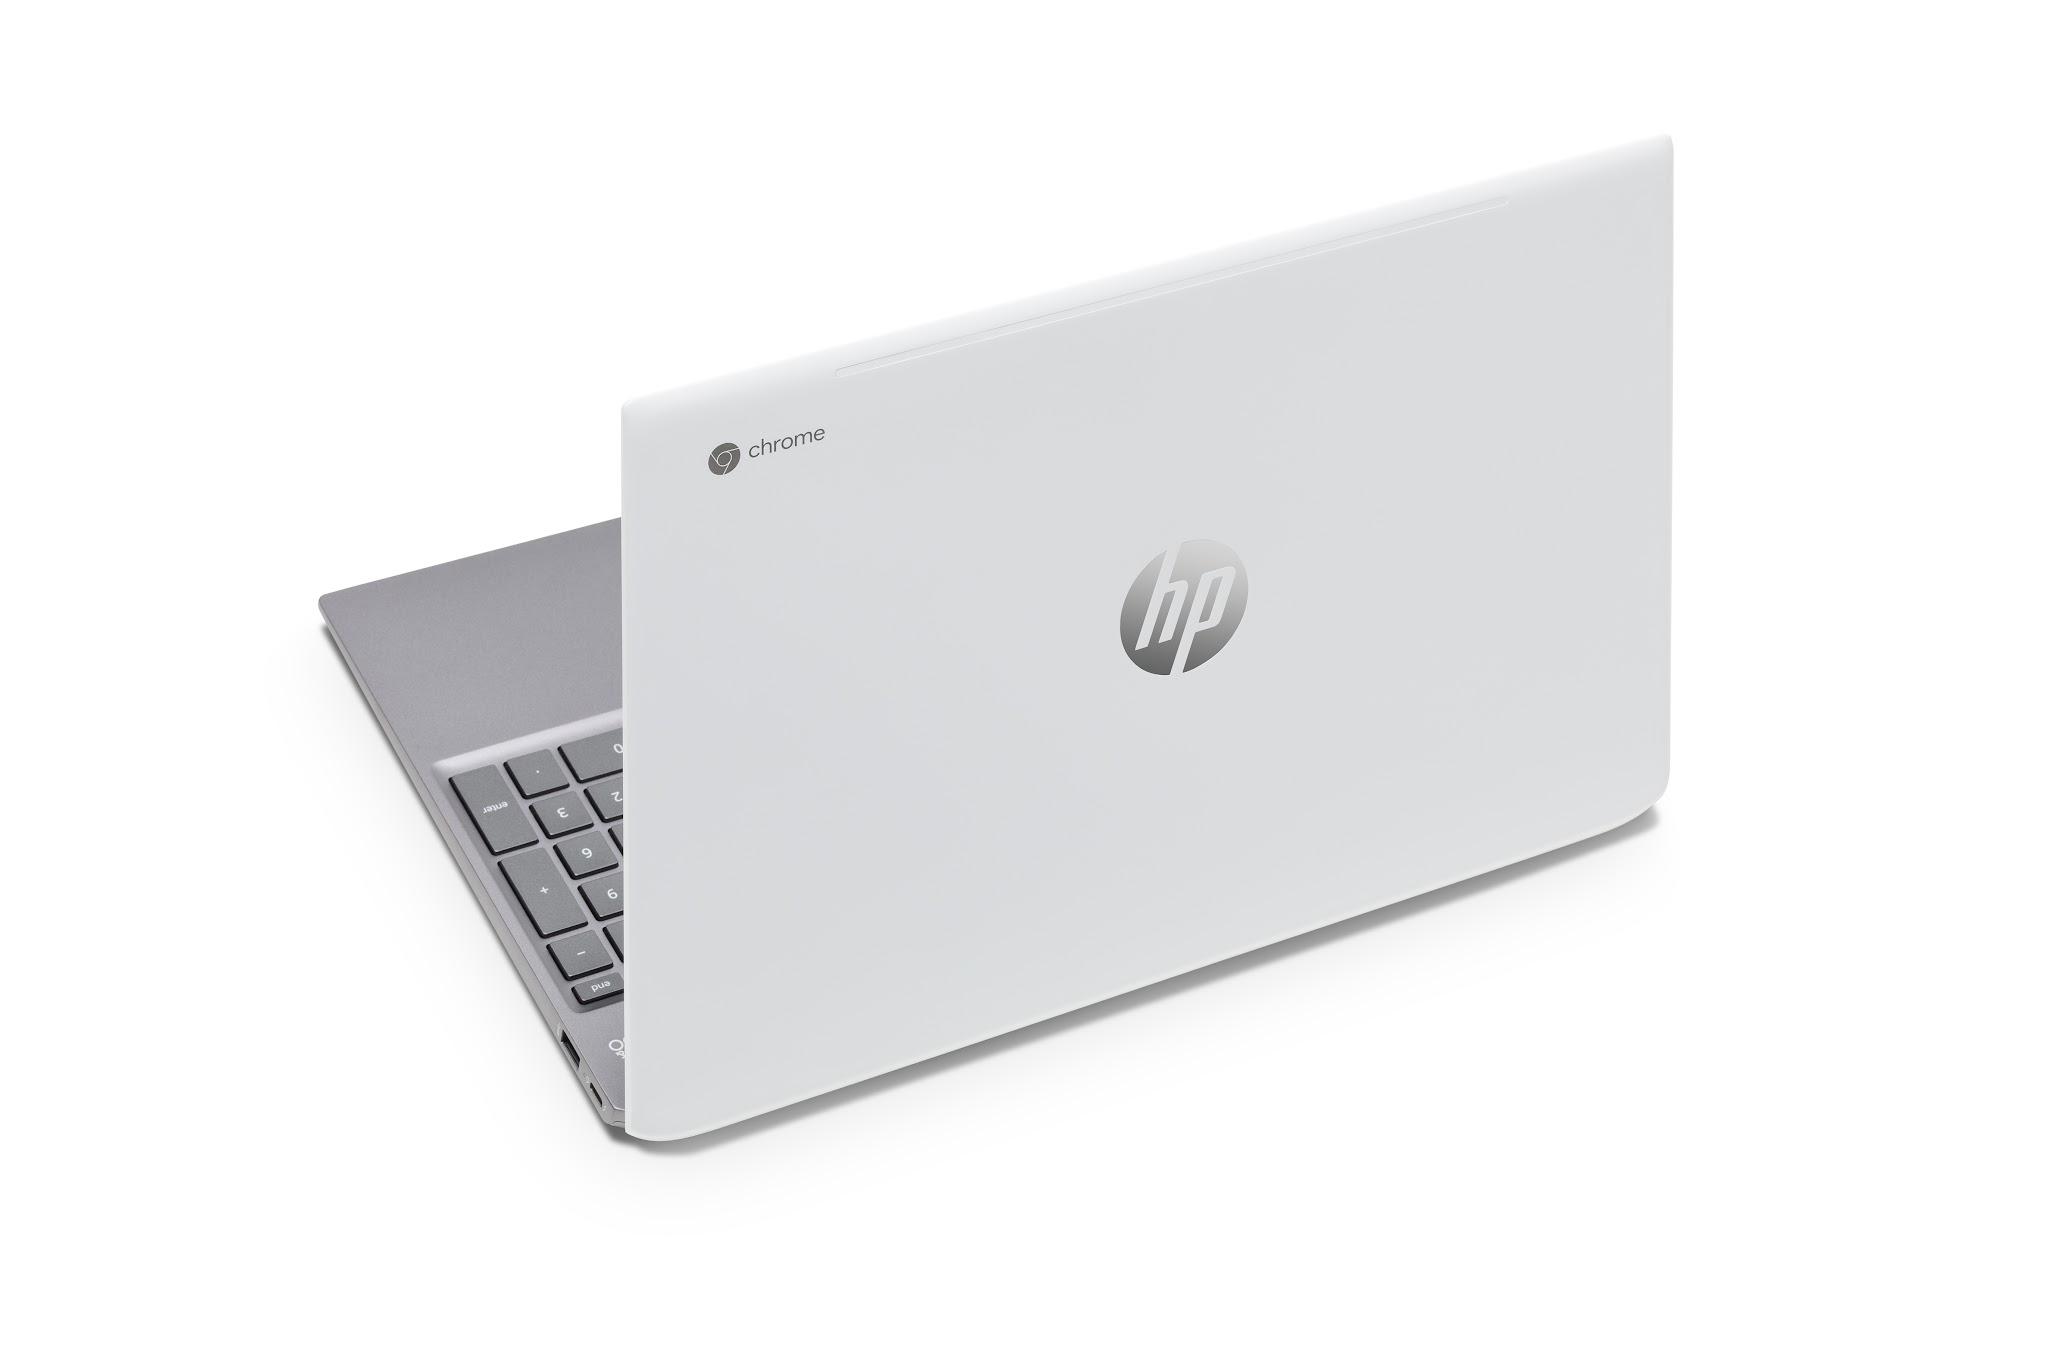 HP Chromebook 15 - photo 10